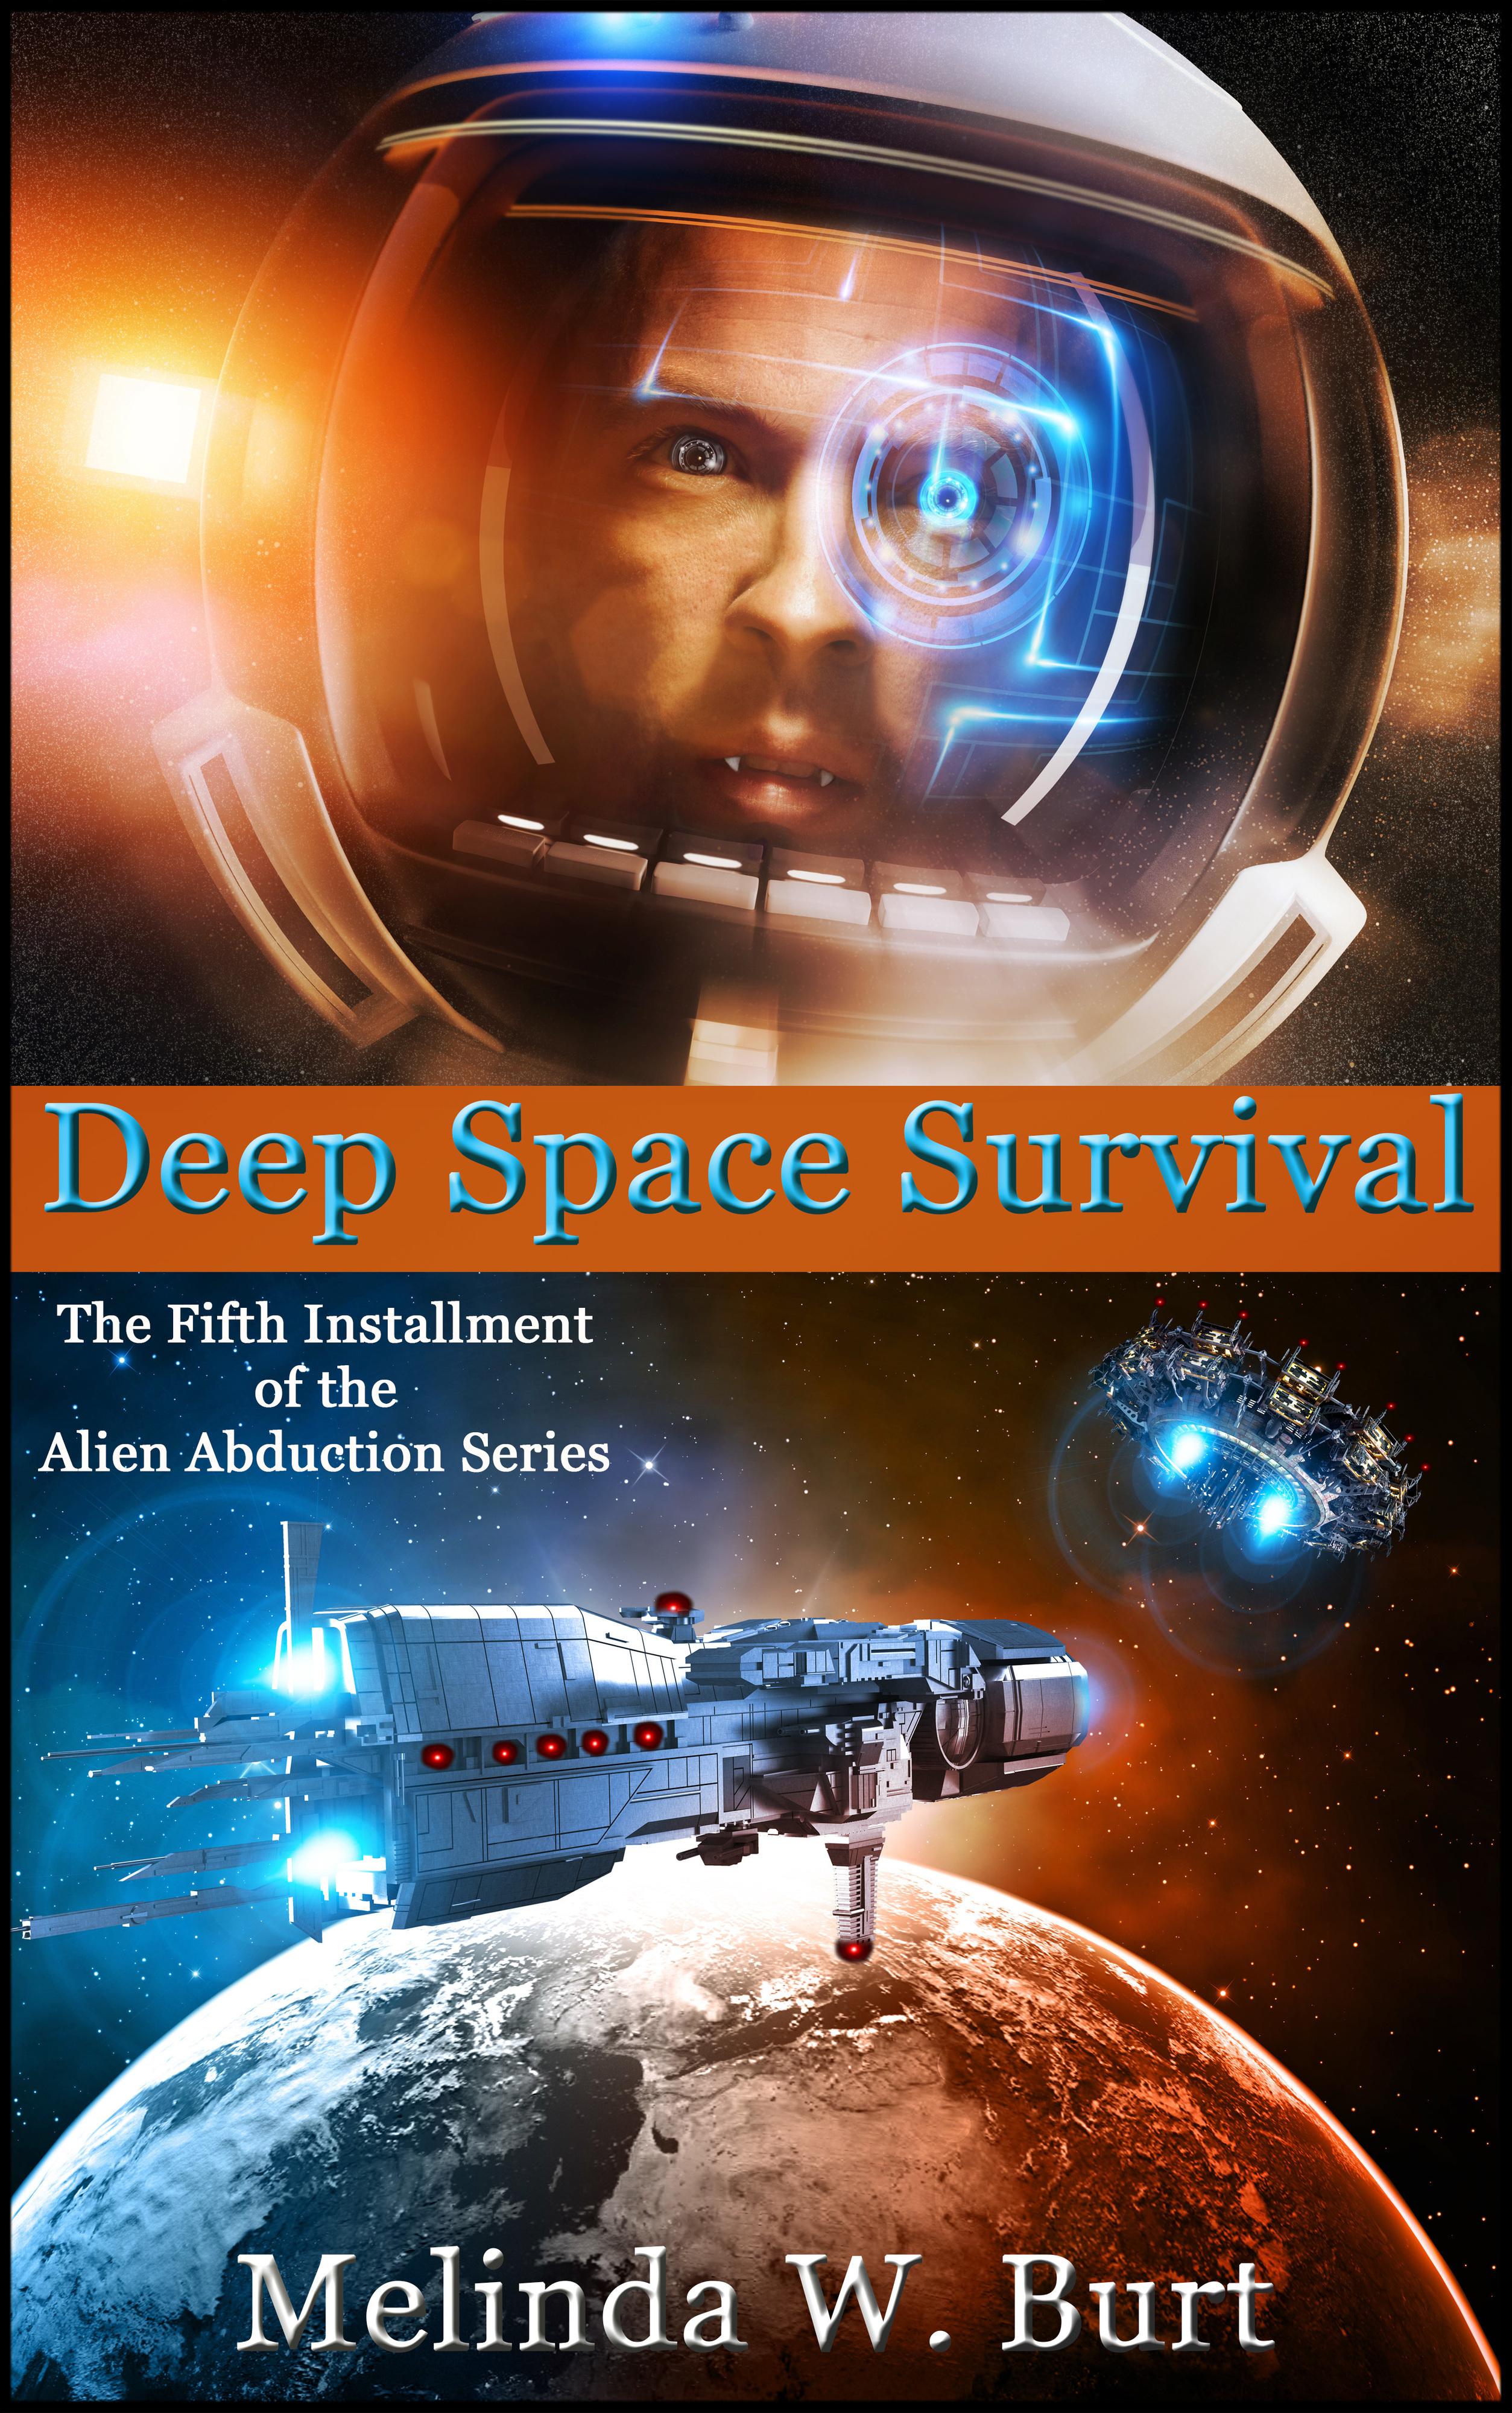 Deep Space Survival (Book Five of the Alien Abduction Series)  by  Melinda W. Burt